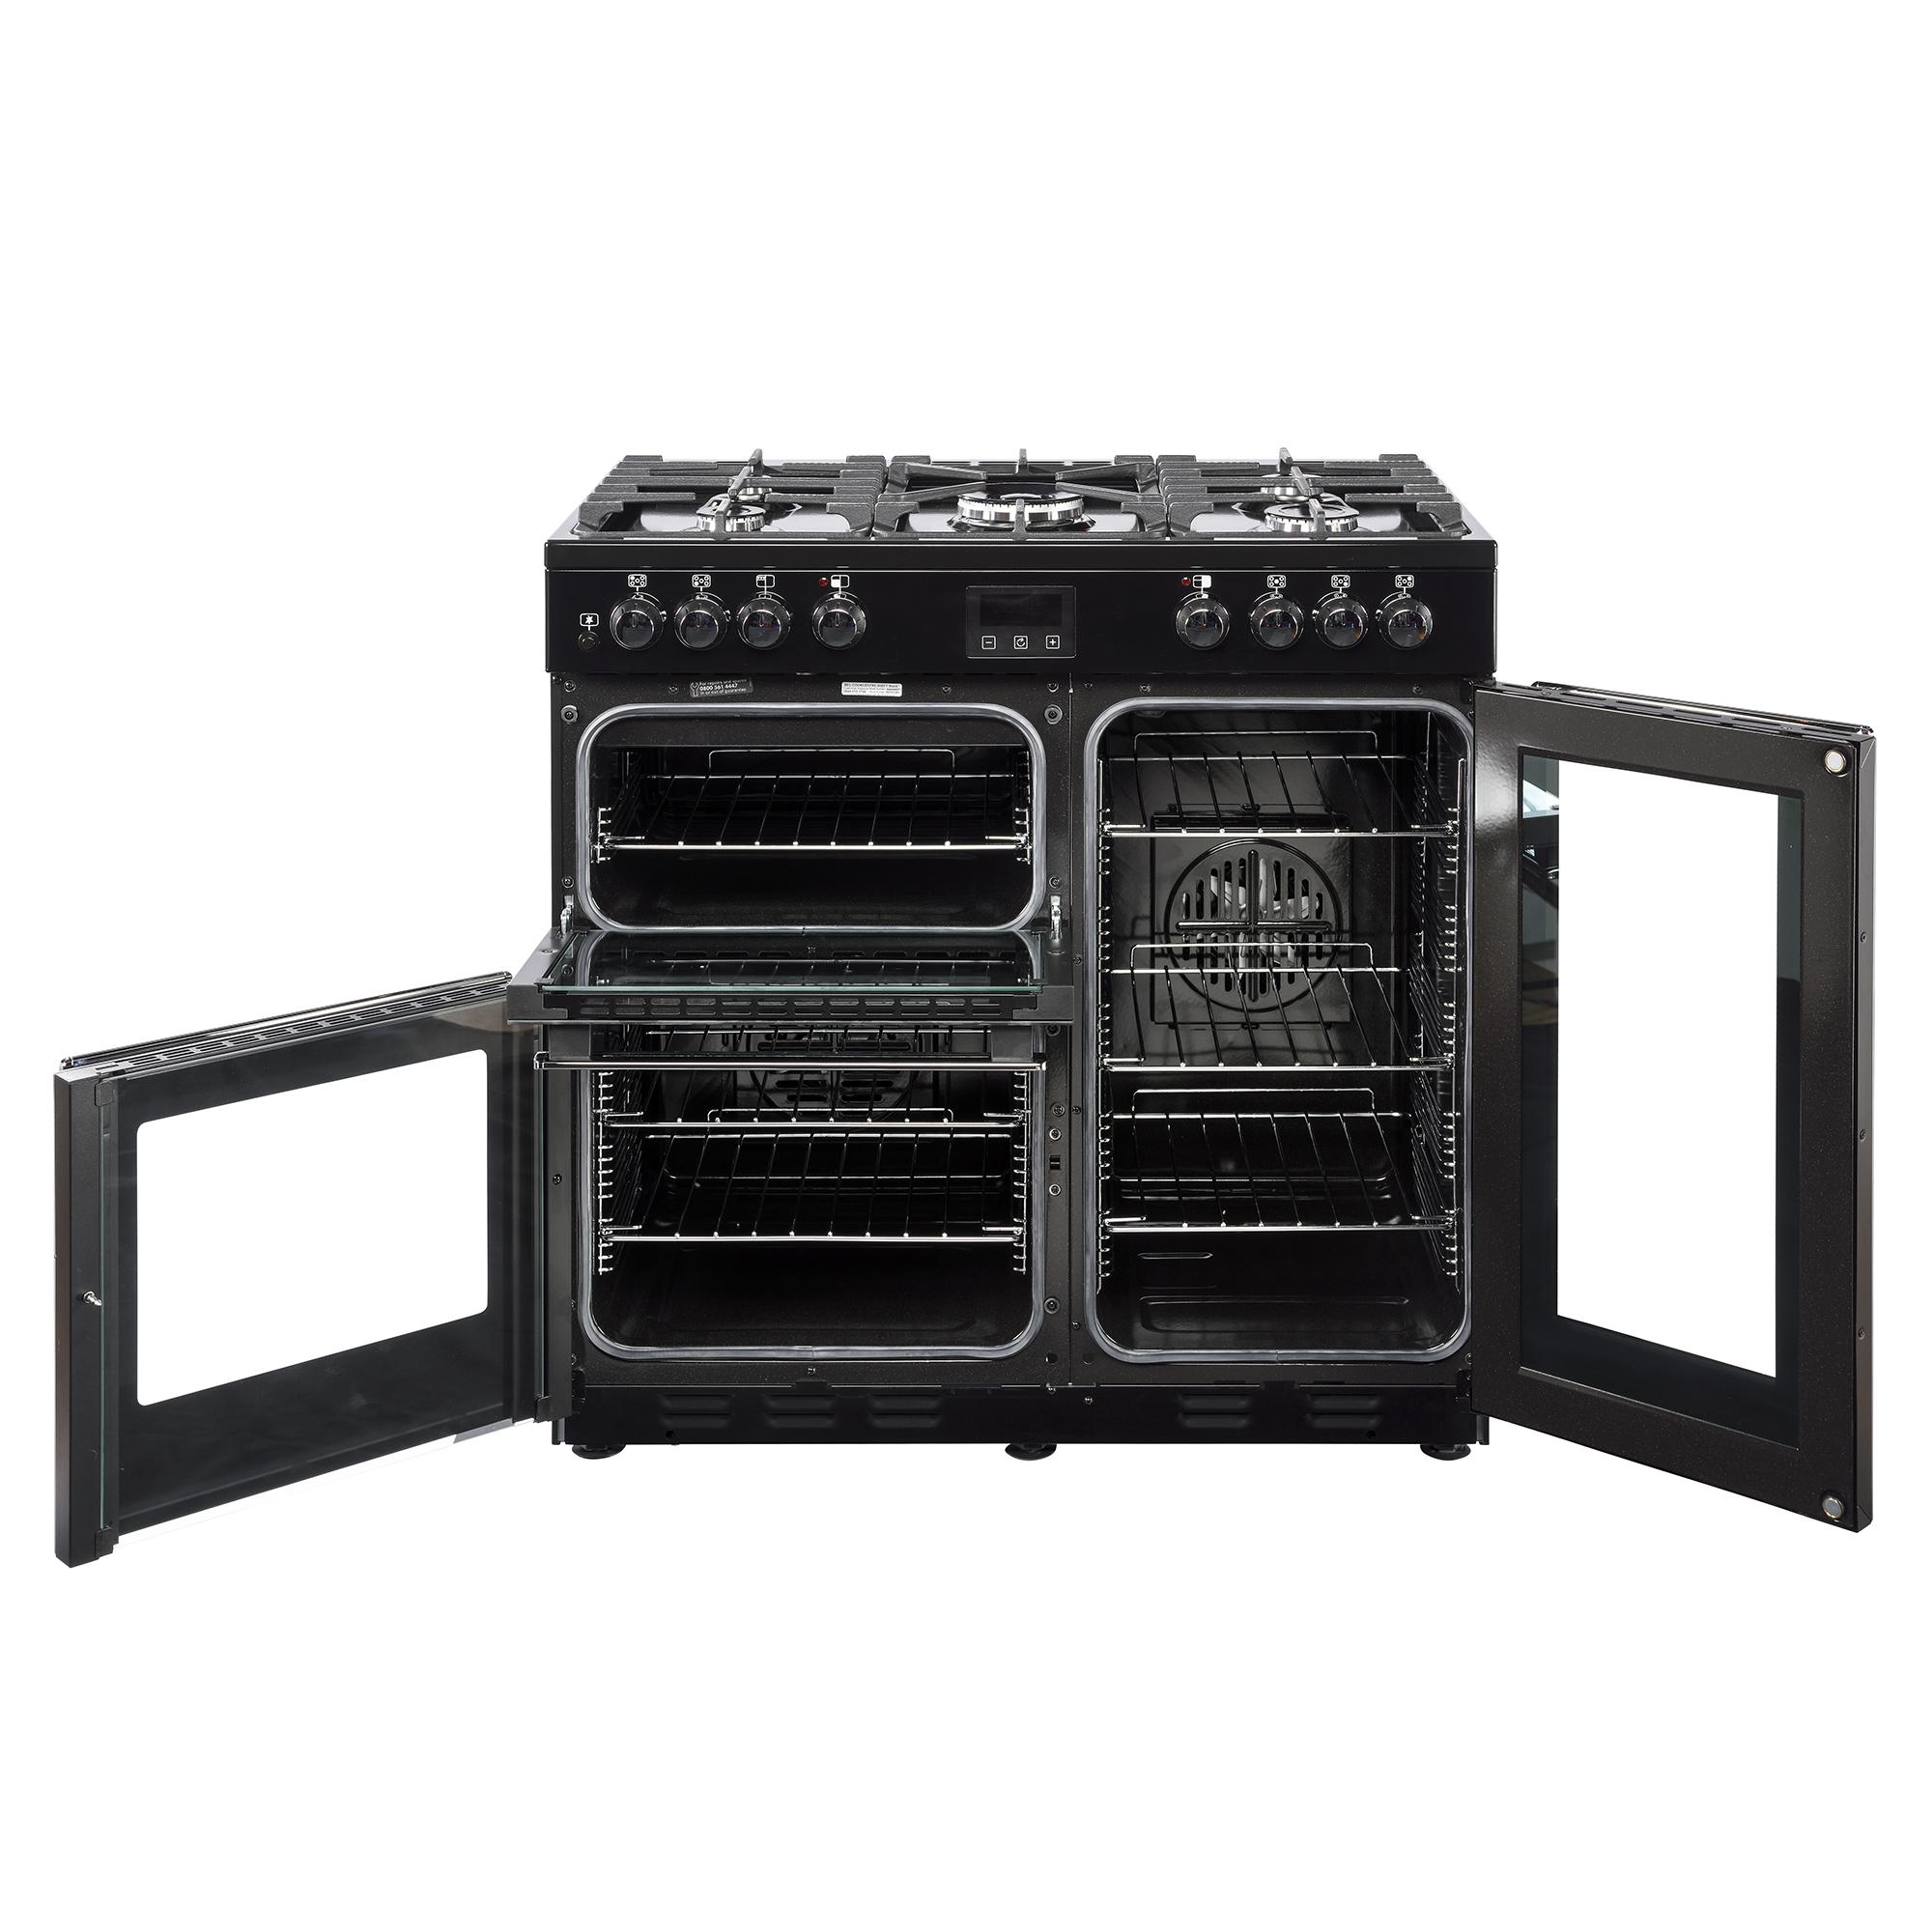 Belling Farmhouse Range Cooker Dx90dft Black